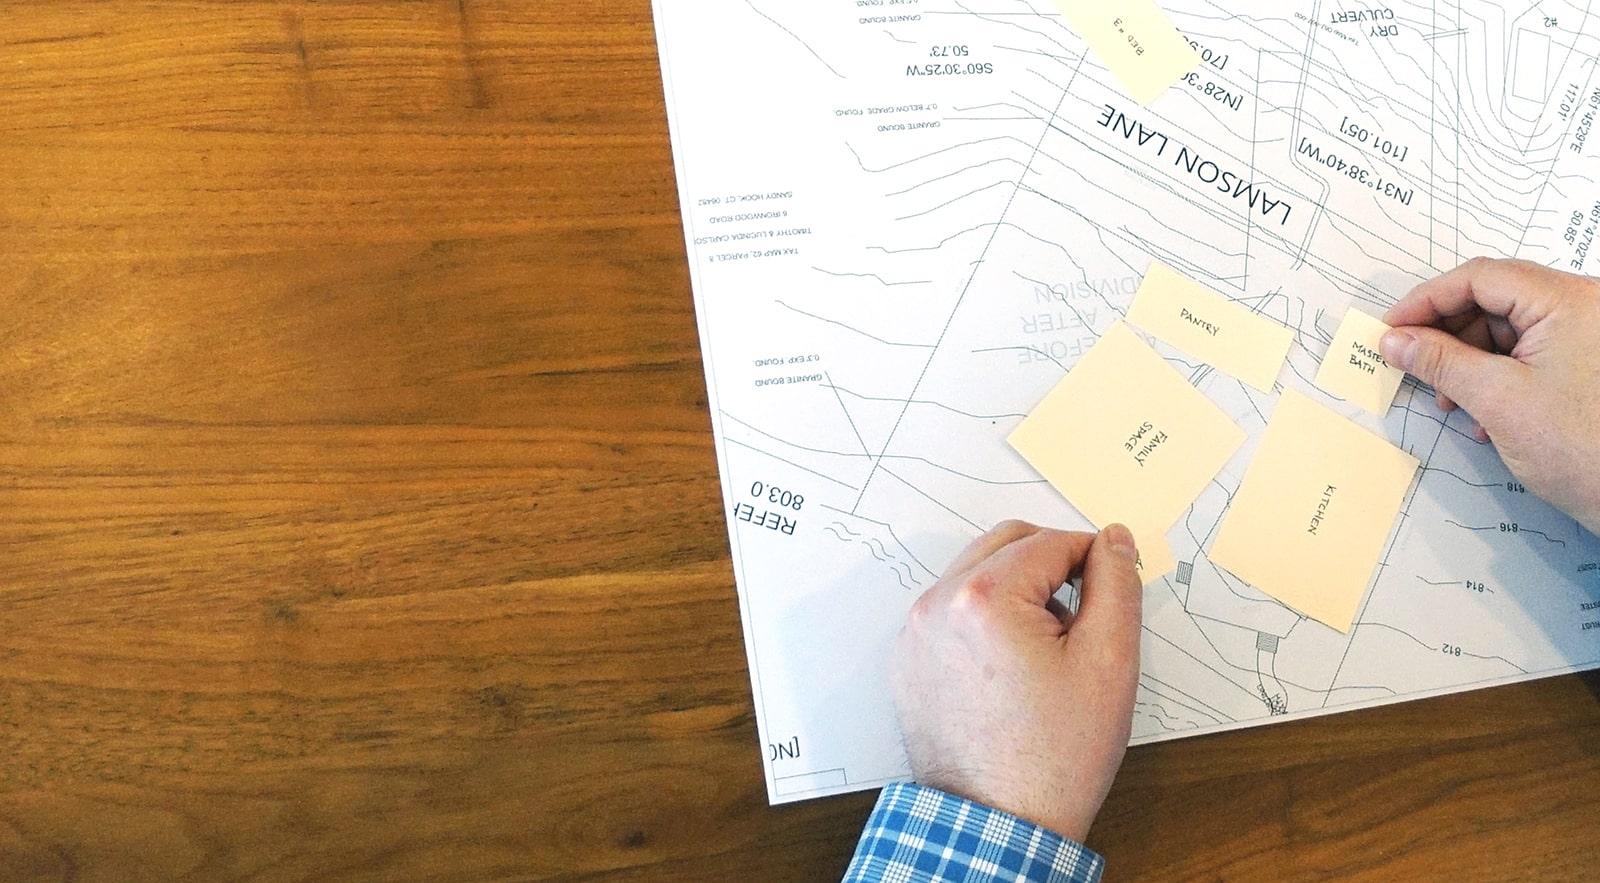 Service Property Assessment Master Planning